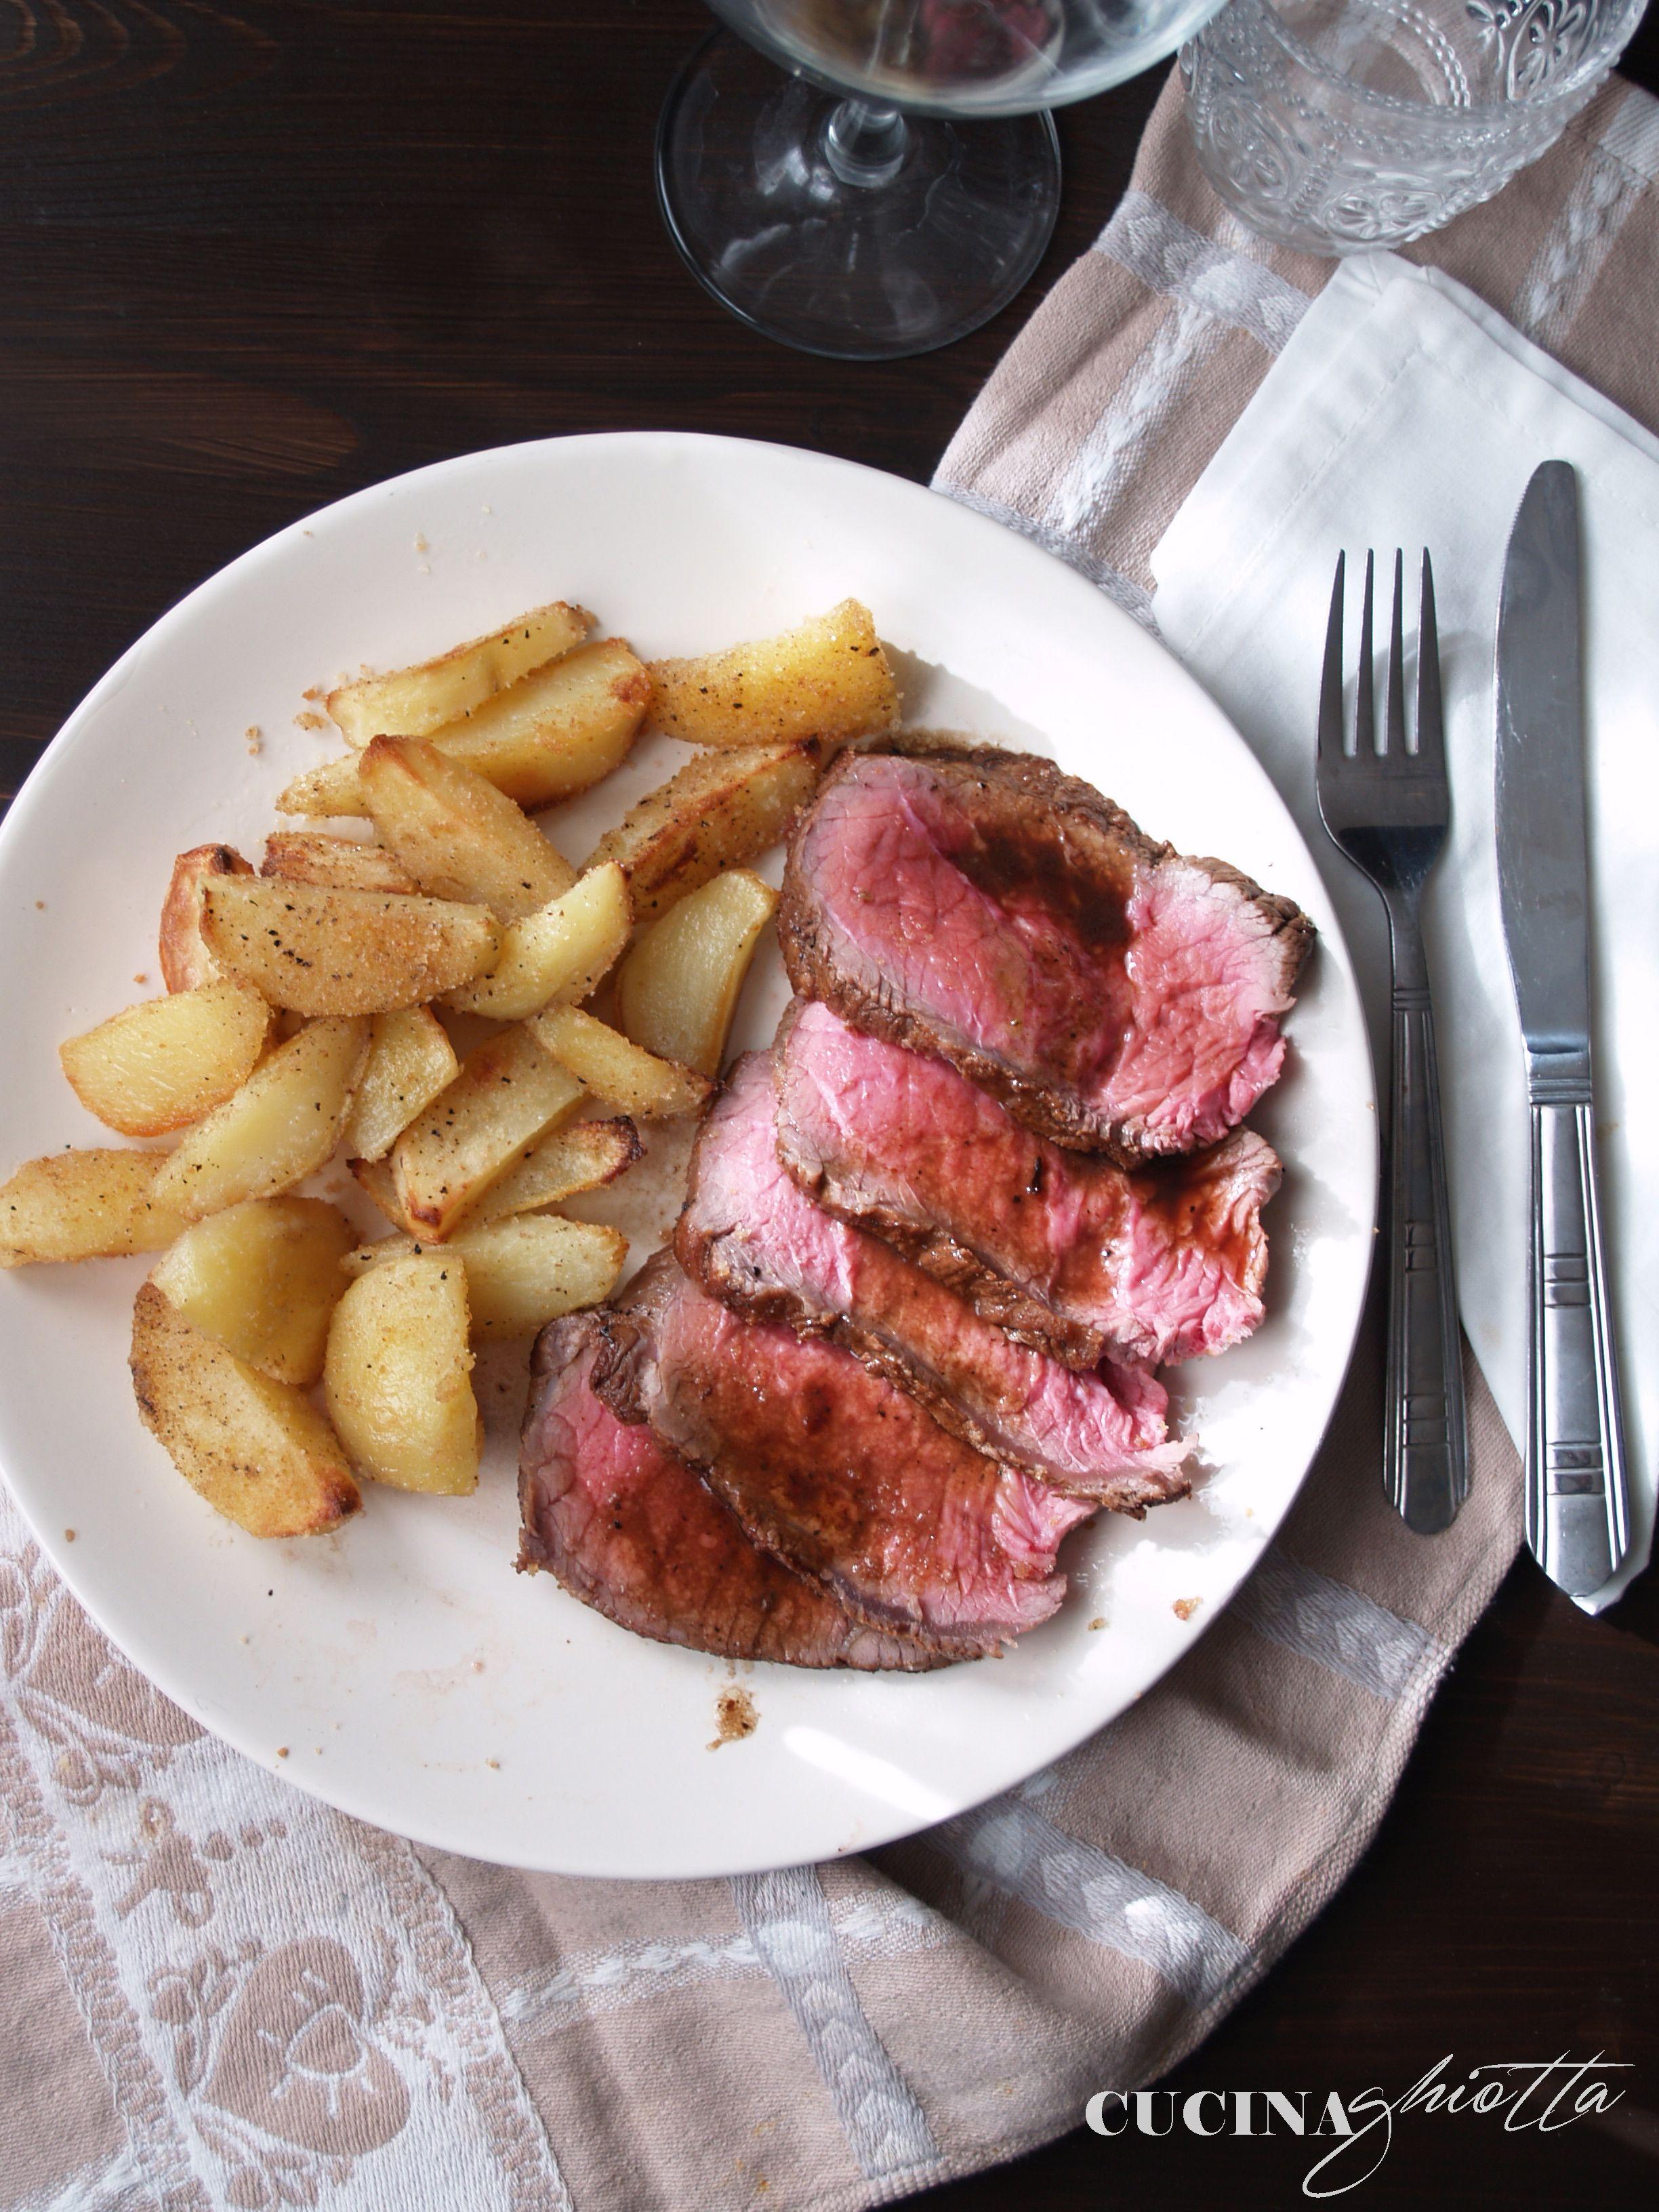 Roast- beef http://www.cucinaghiotta.it/2014/11/roast-beef.html